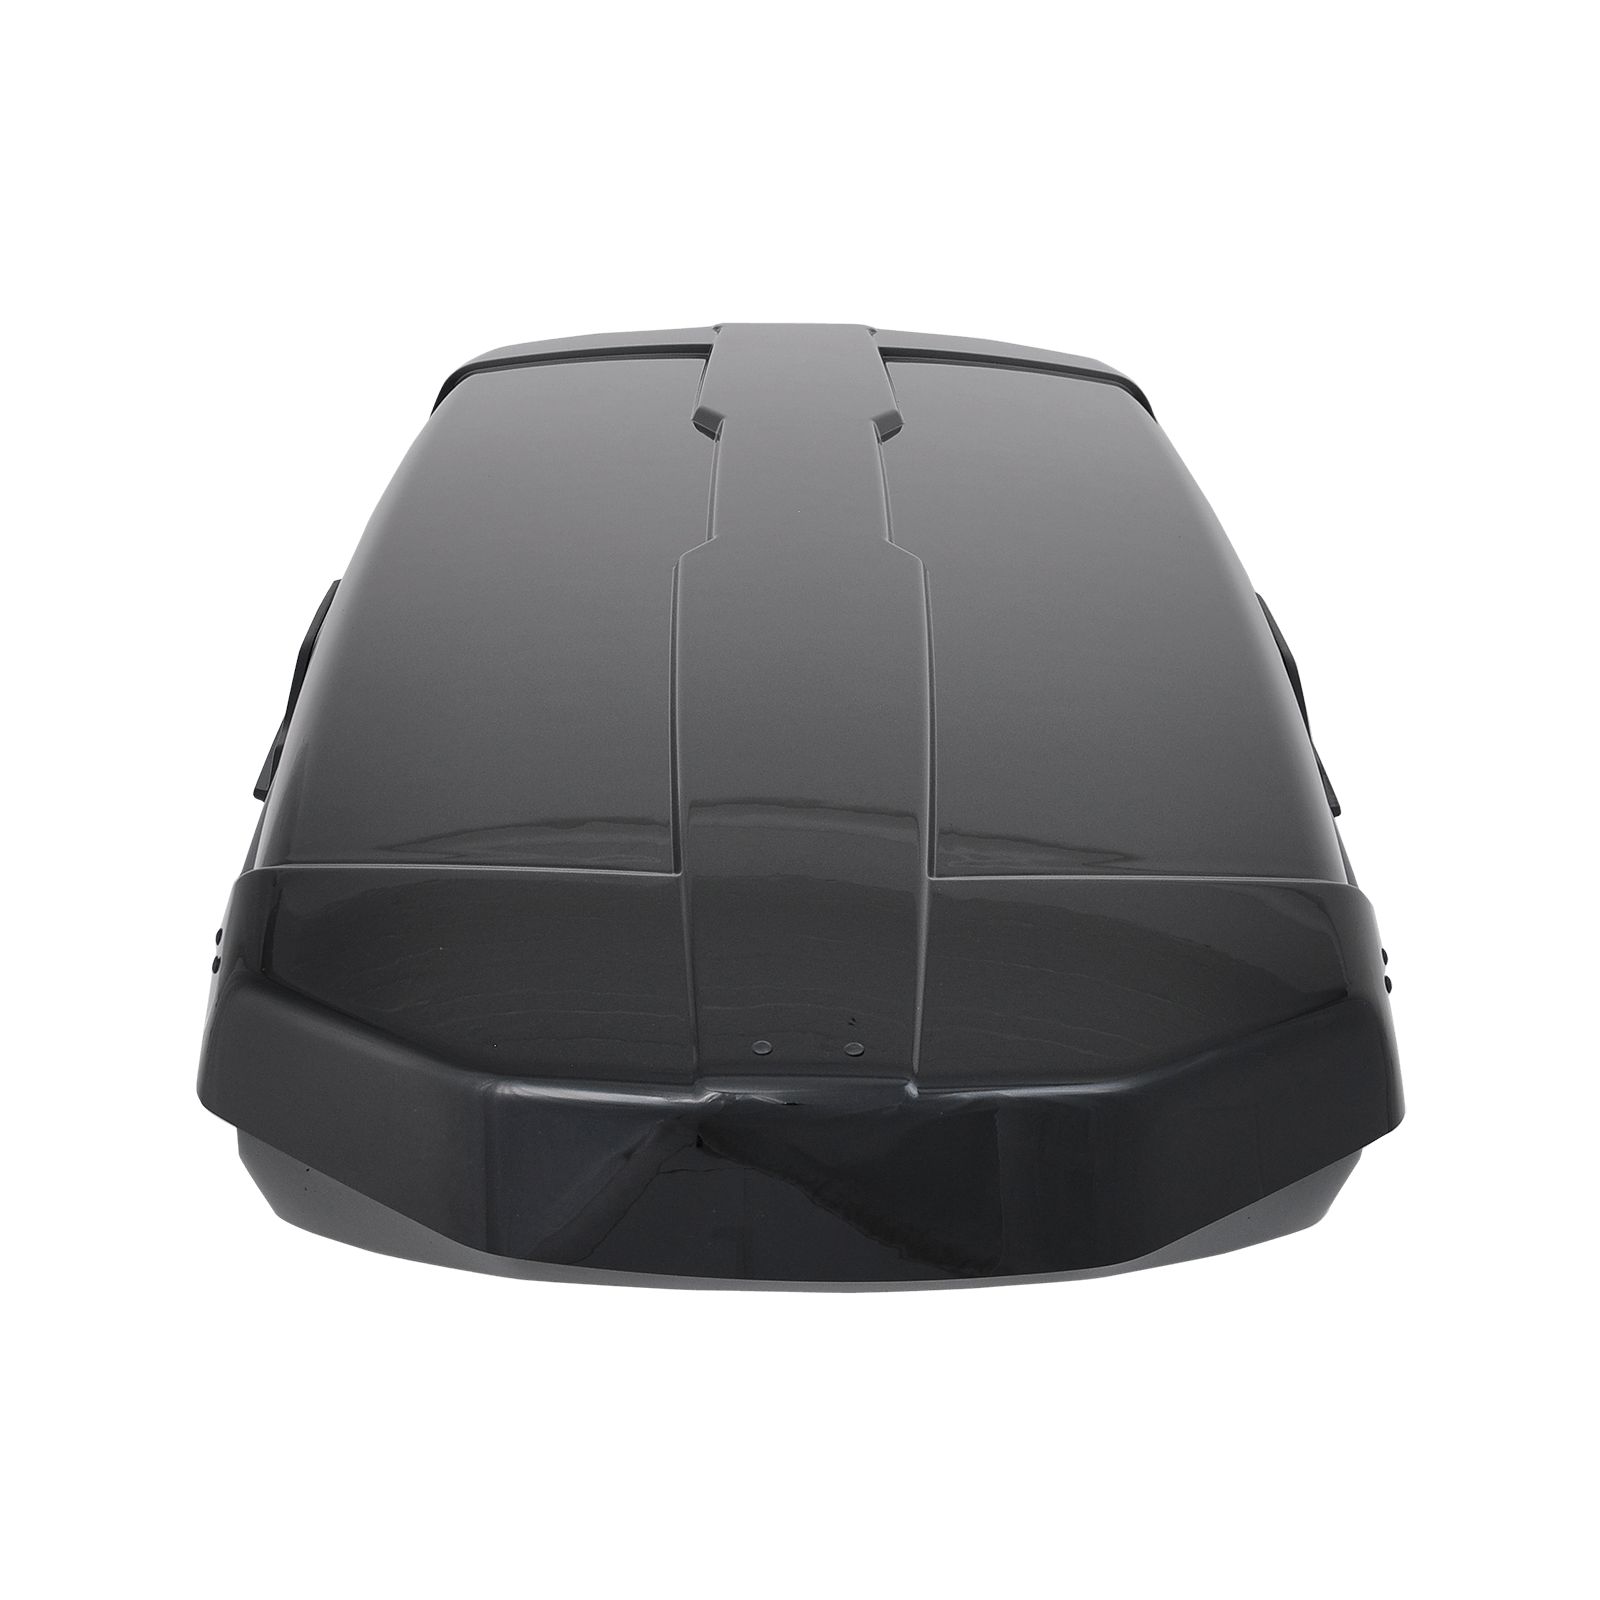 Dachbox Thule Motion XT Alpine Black Glossy - Bild 3